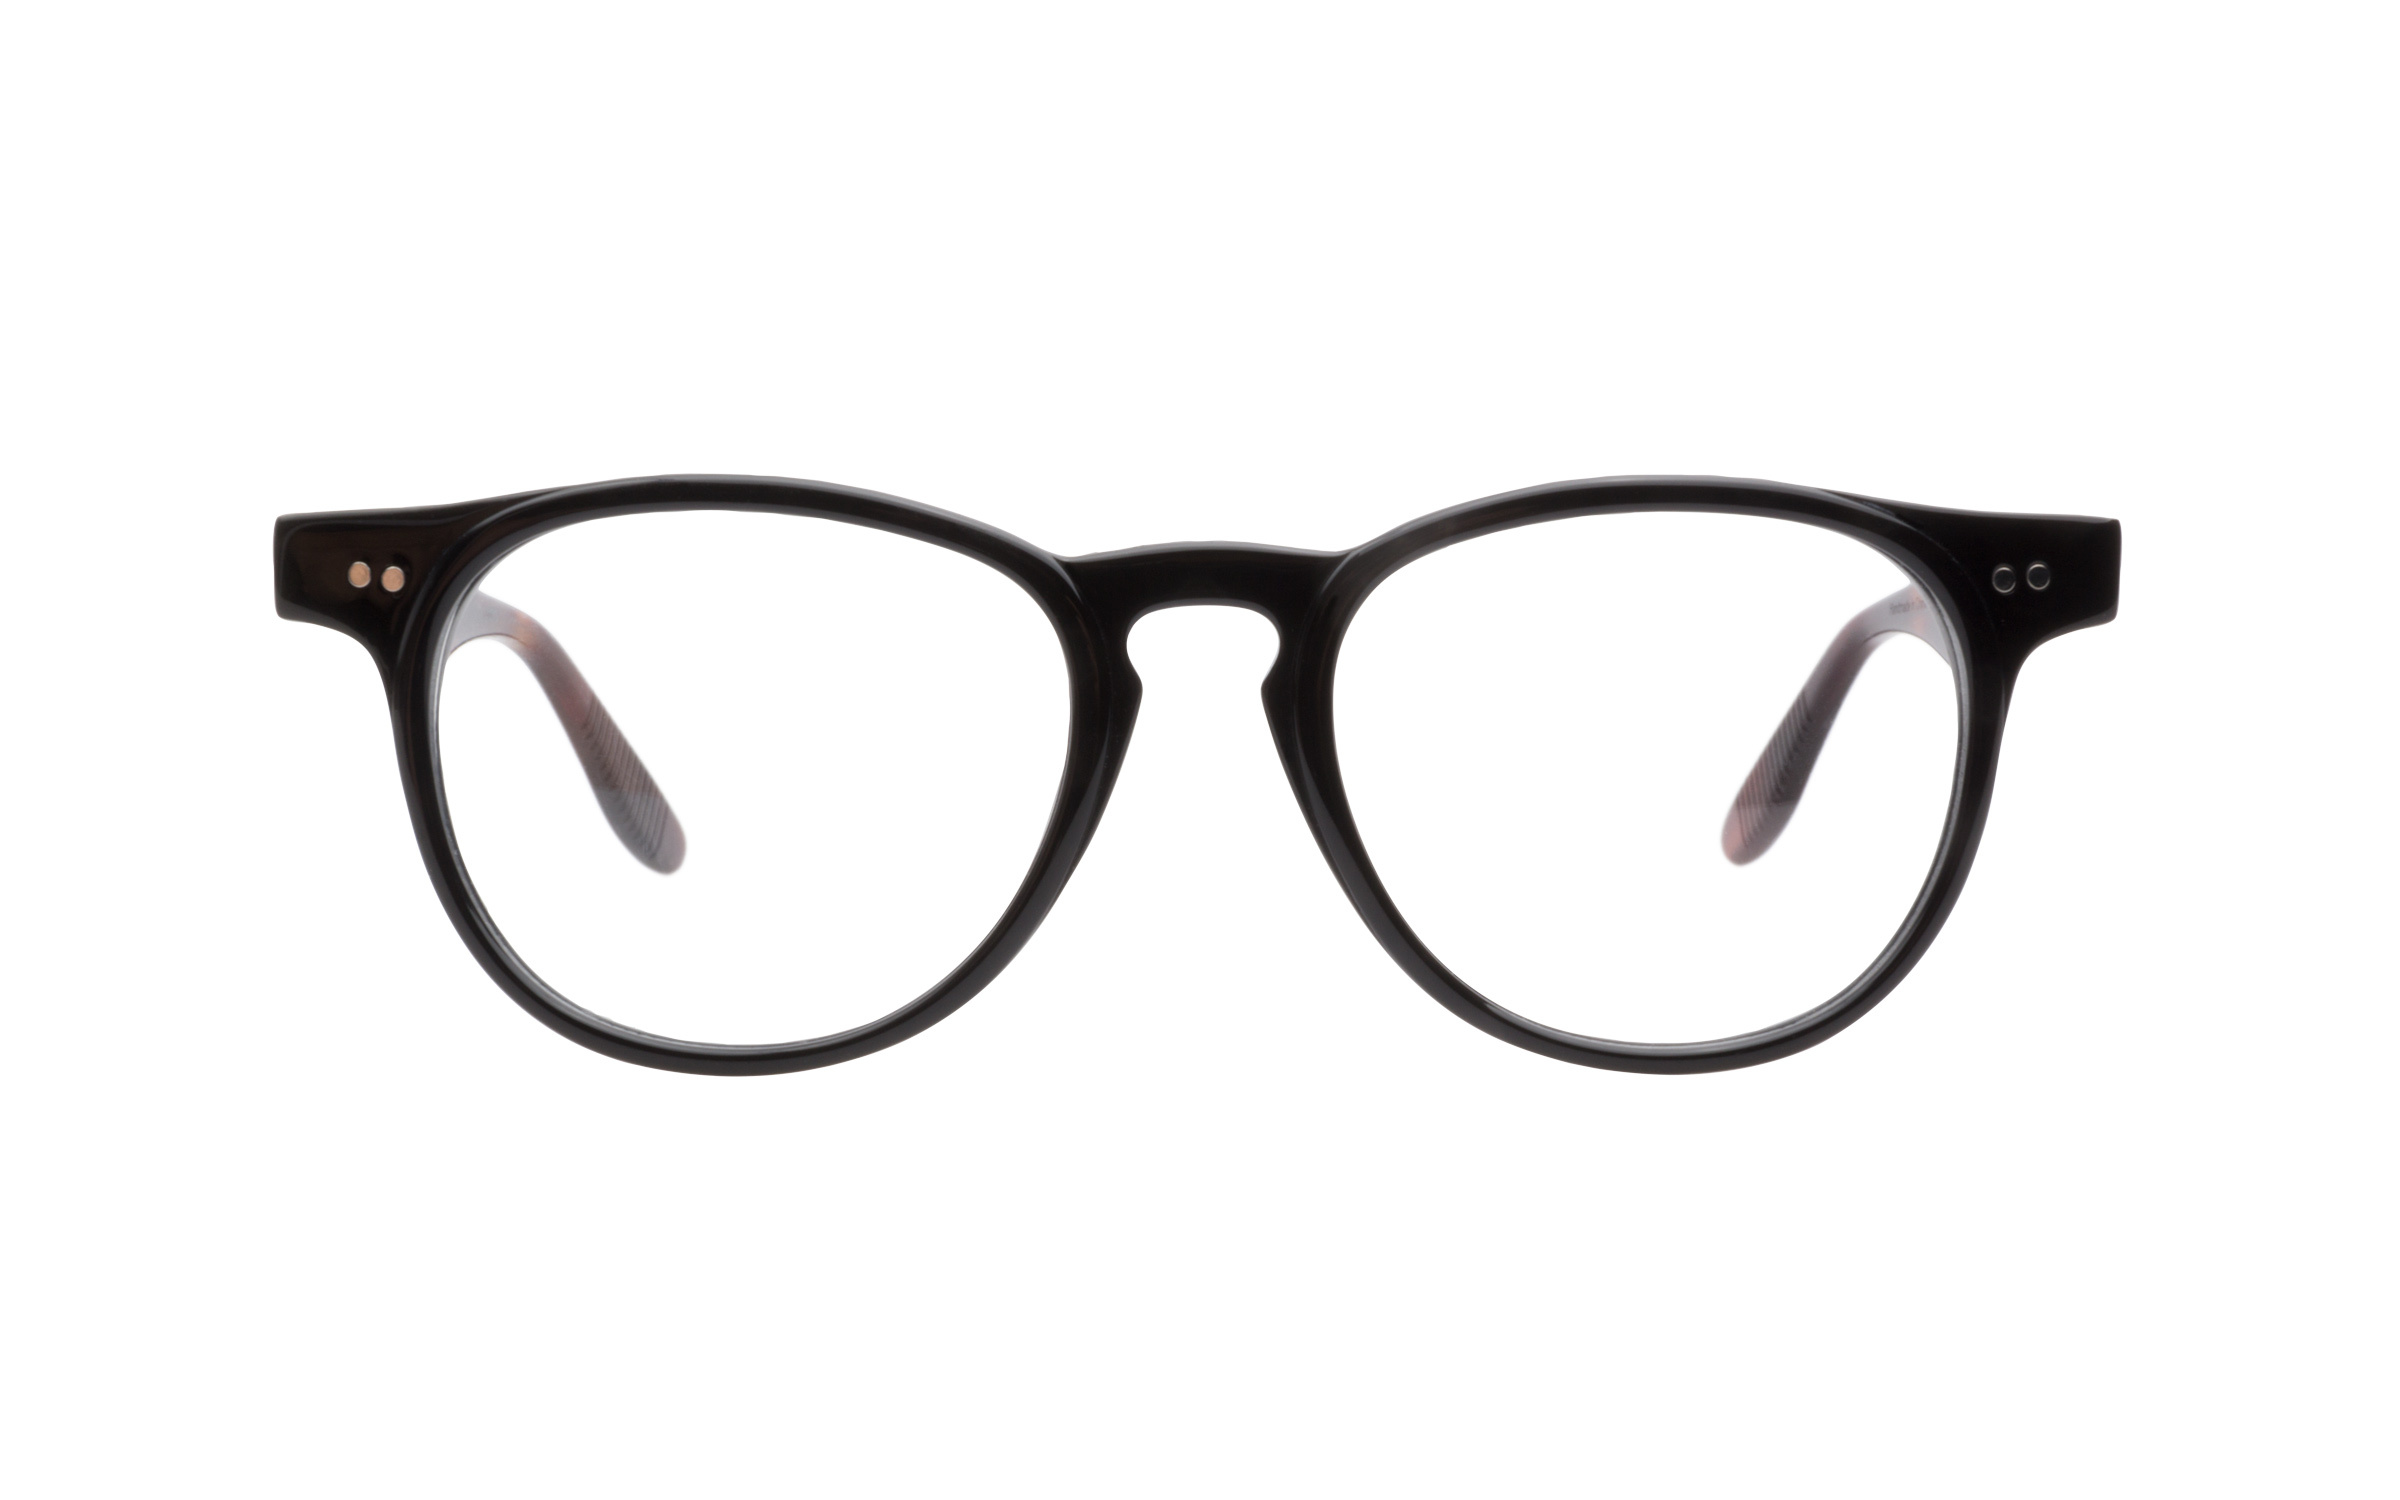 Mens_Vintage_Glasses_Black_Joseph_Marc_Online_Coastal